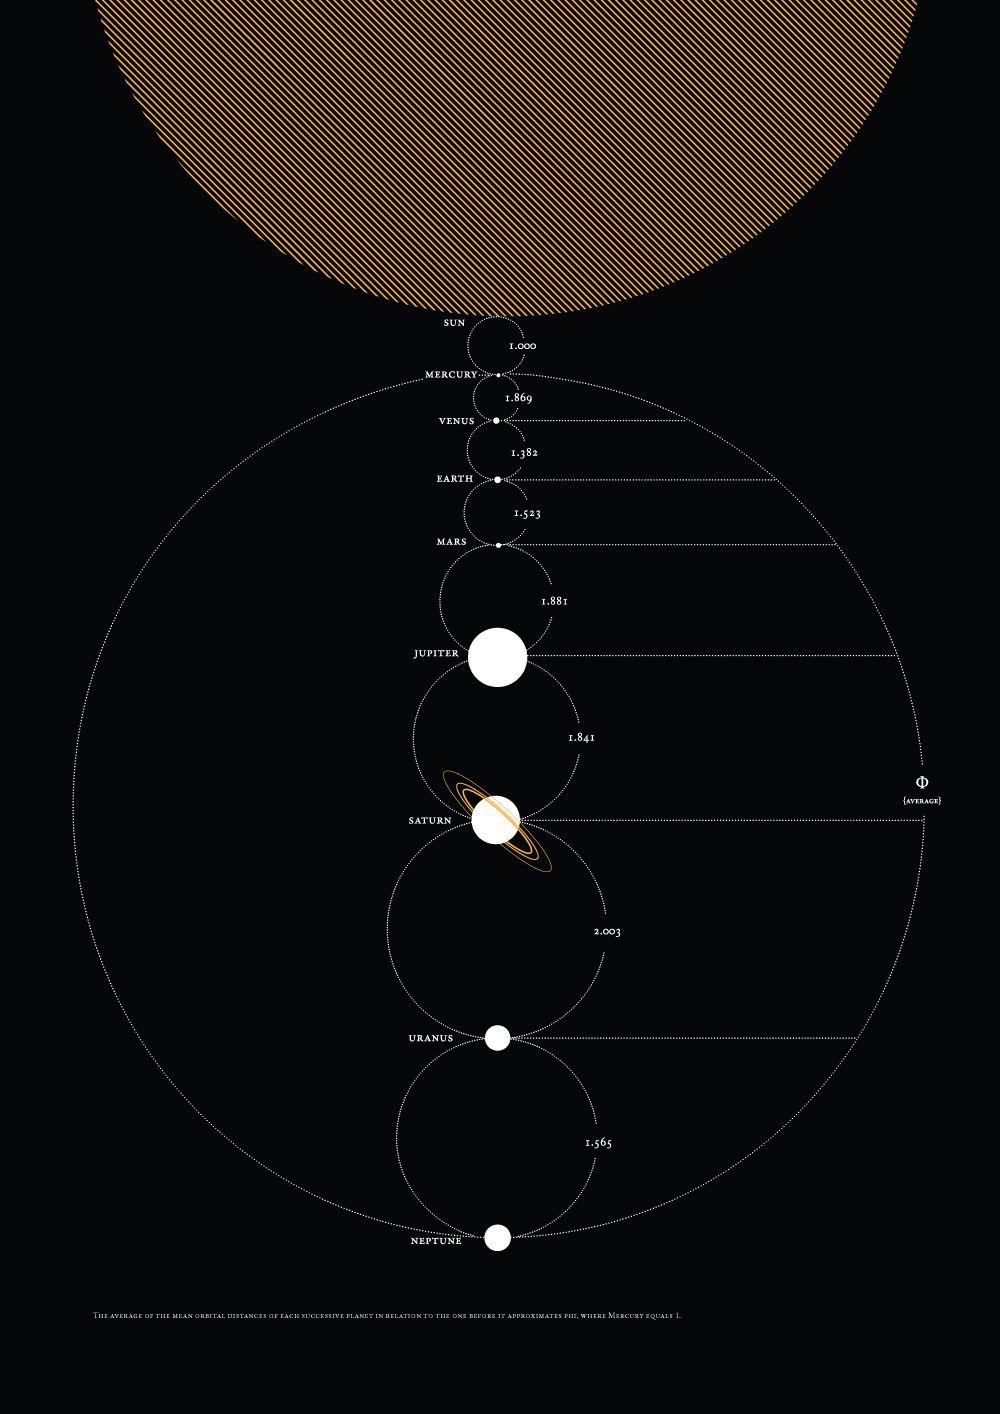 Poster design golden ratio - The Golden Ratio Solar System Poster Design